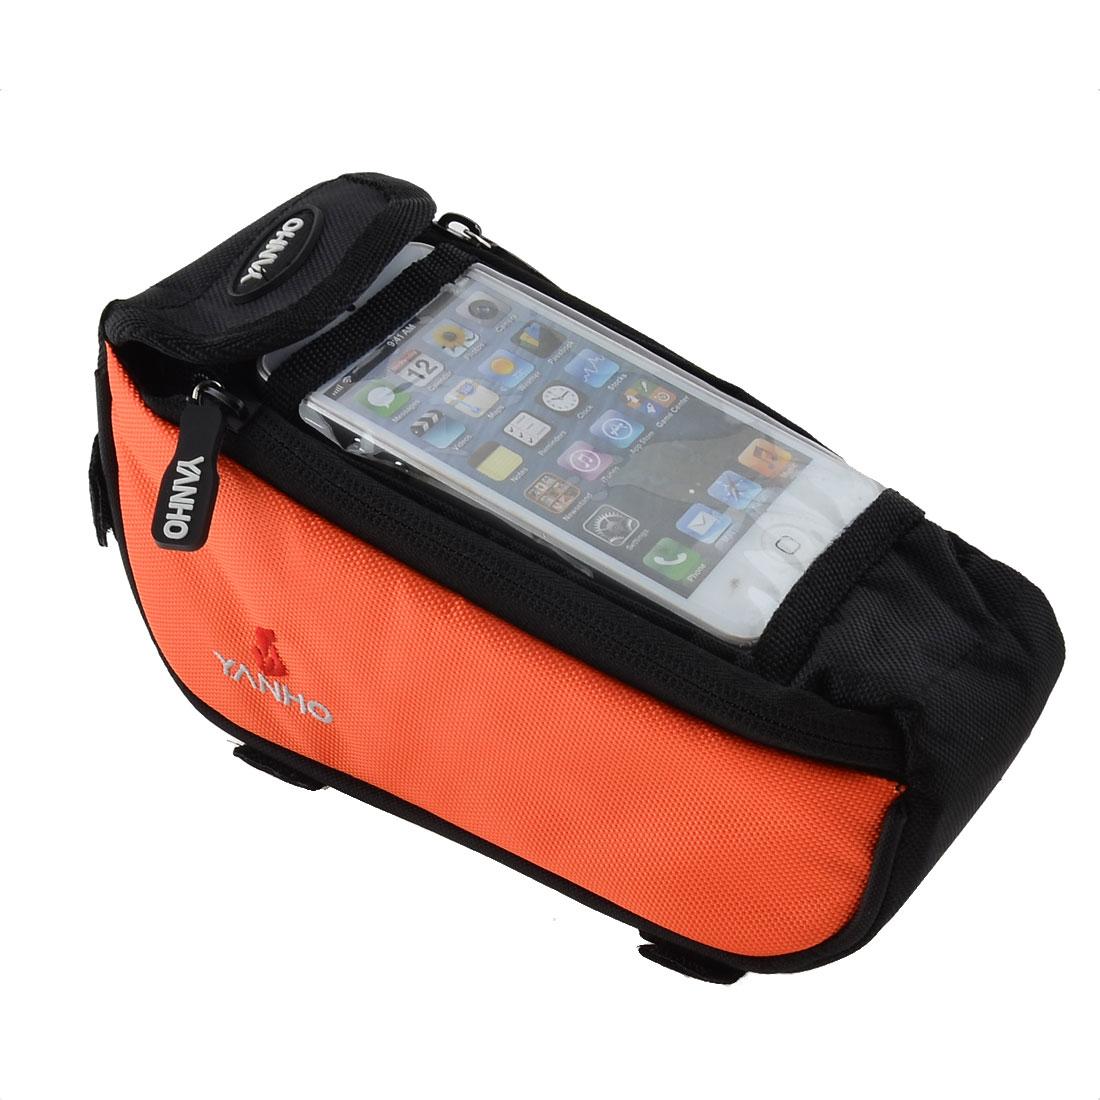 Bike Bicycle Front Top Tube Bag Pannier Case Cell Phone Holder Orange